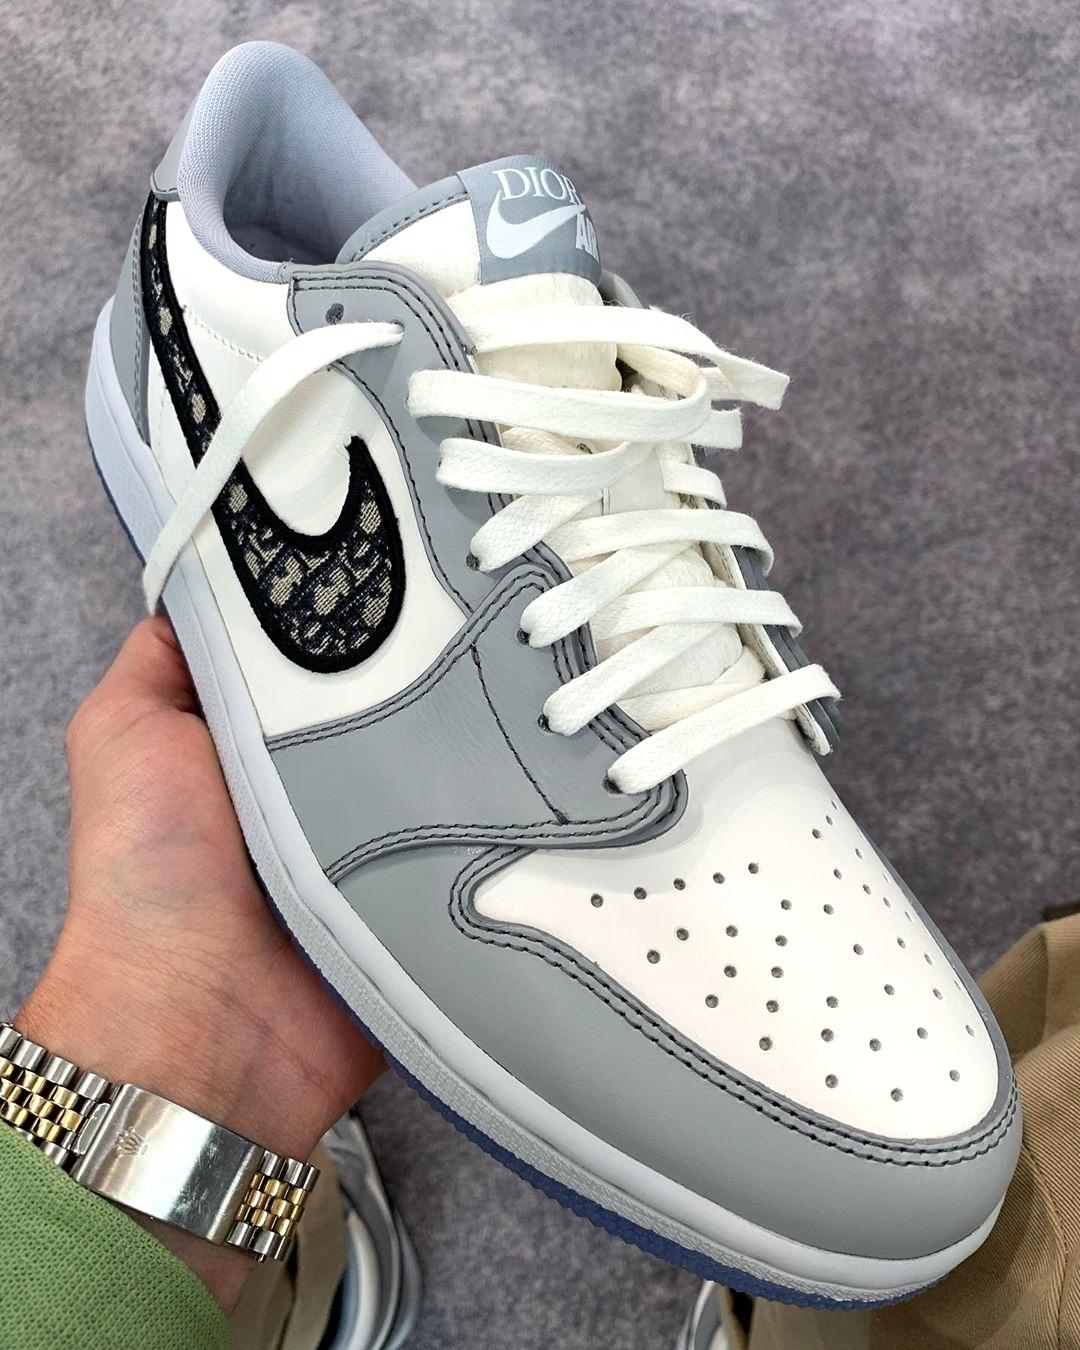 Dior x Air Jordan 1 Low - подробности релиза